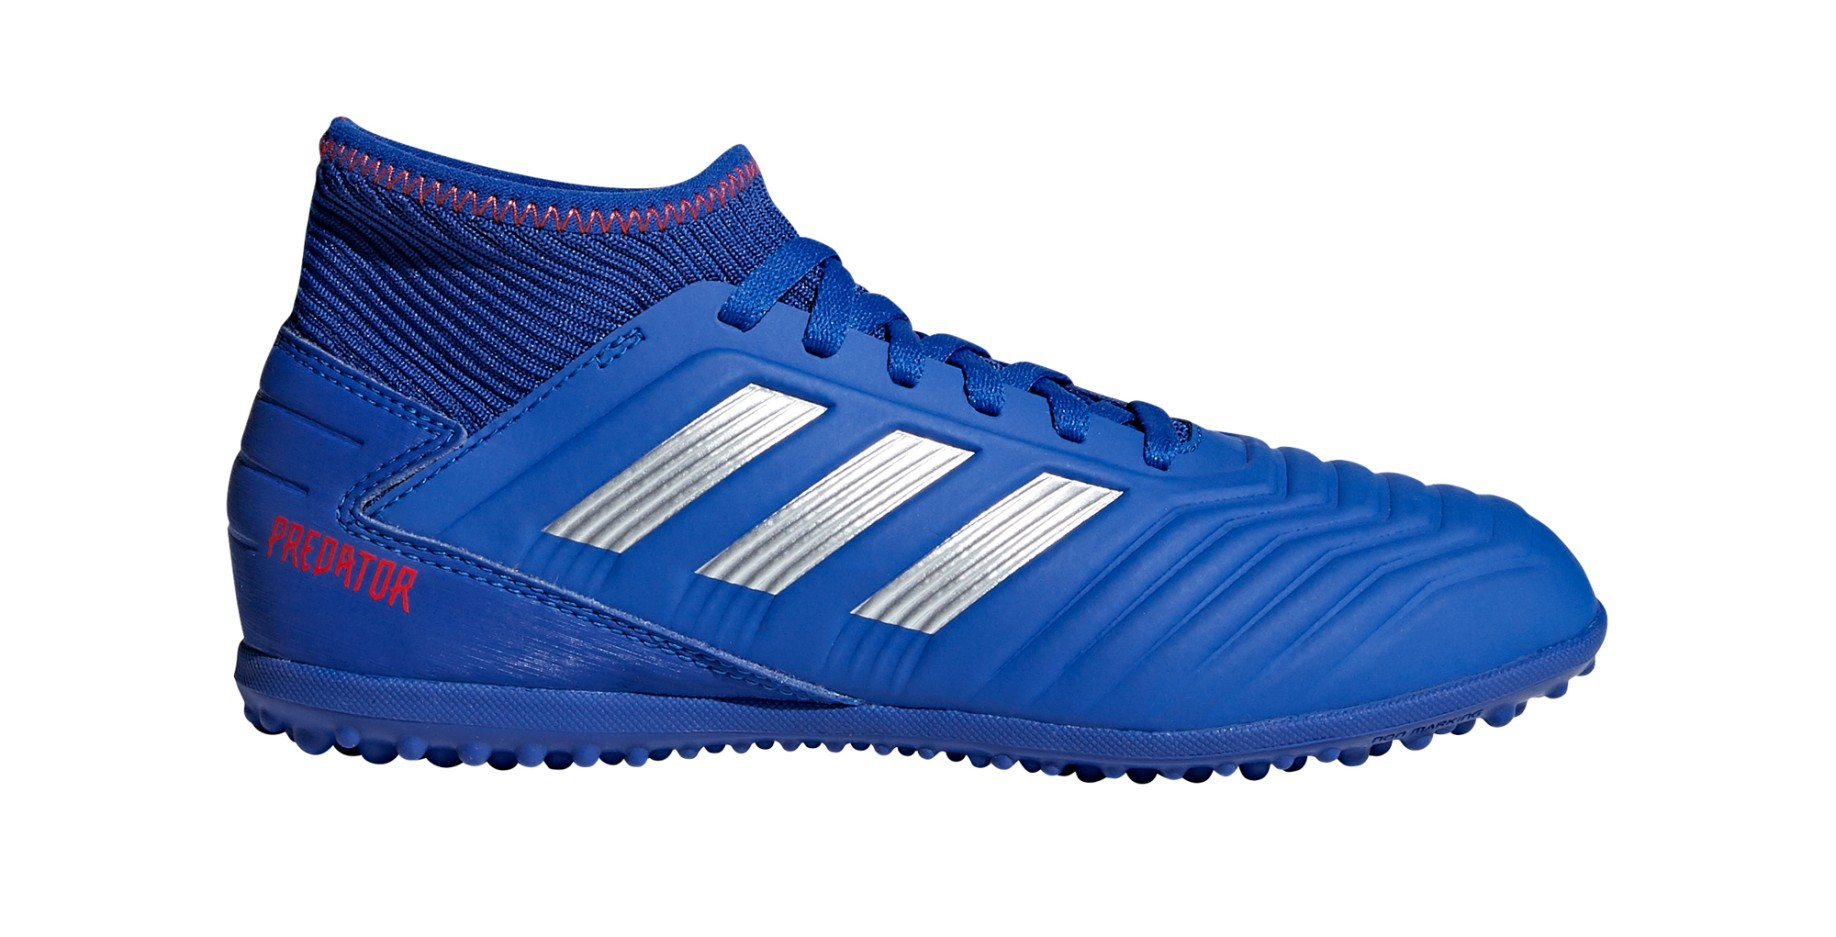 Schuhe Fussball Kinder Adidas Predator 19.3 TF Exhibit Pack